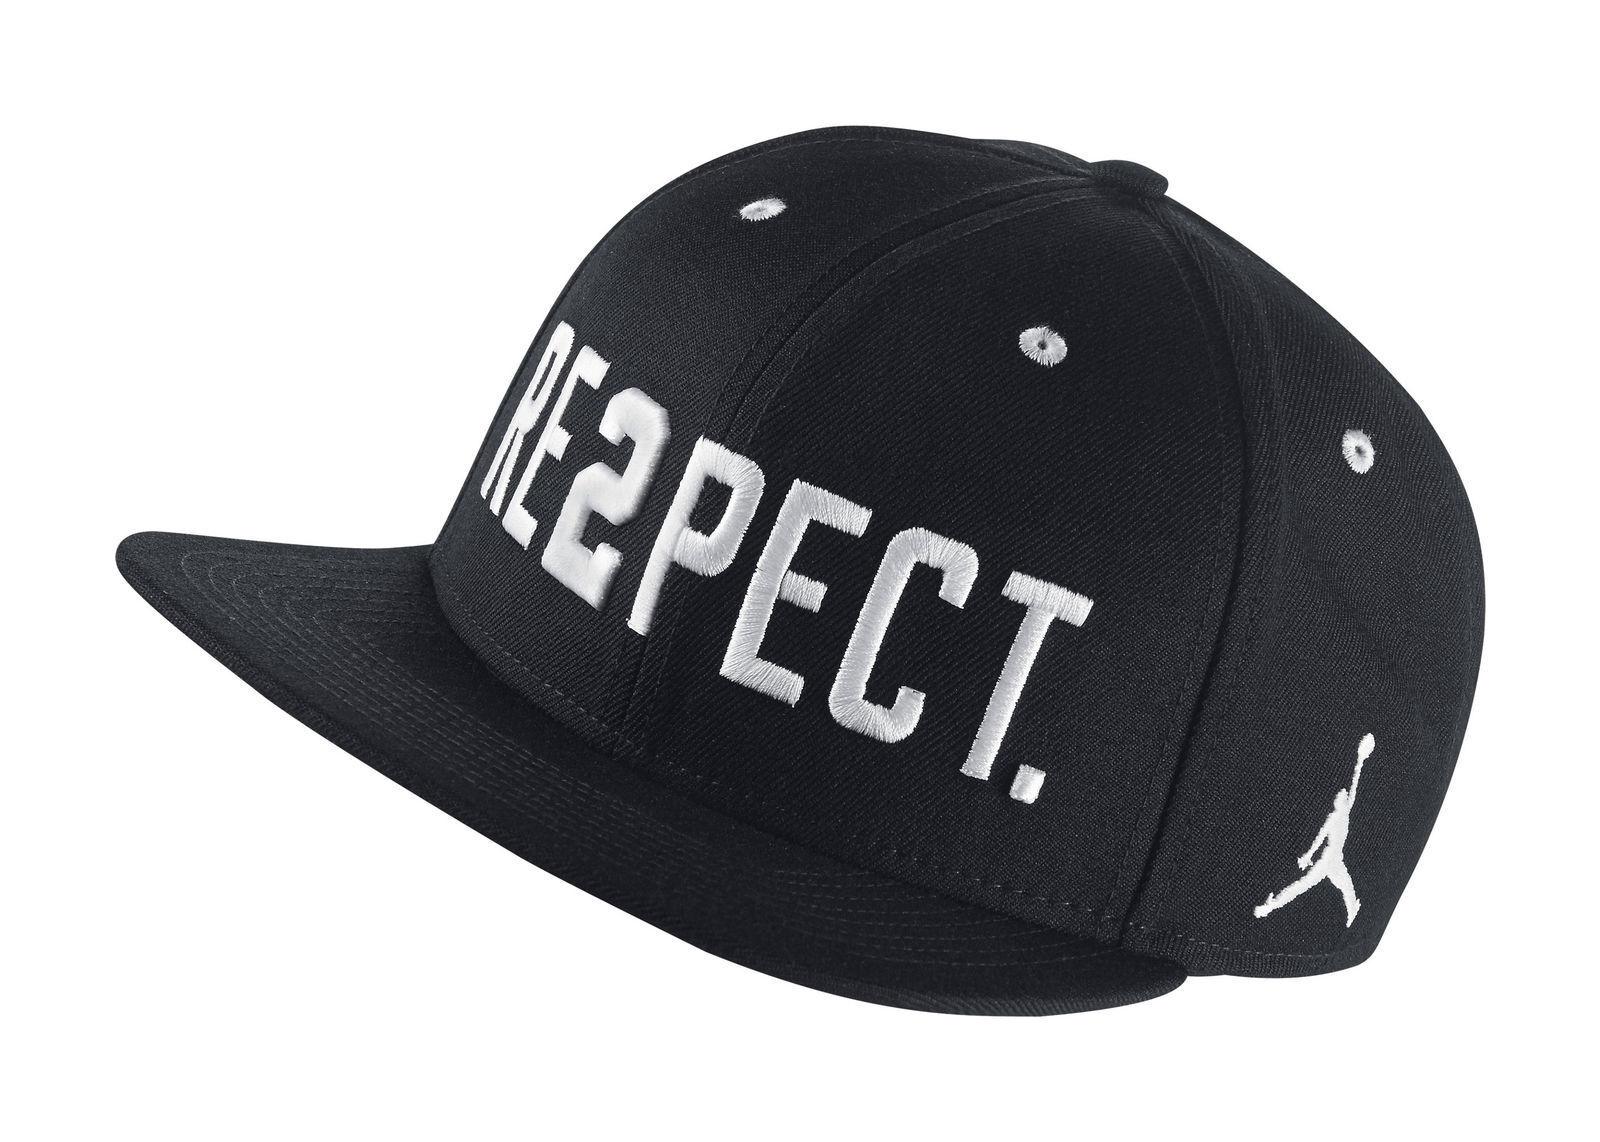 715ffe1120216 Nike Jordan Derek Jeter Re2pect Respect Retirement Snapback Hat Cap ...